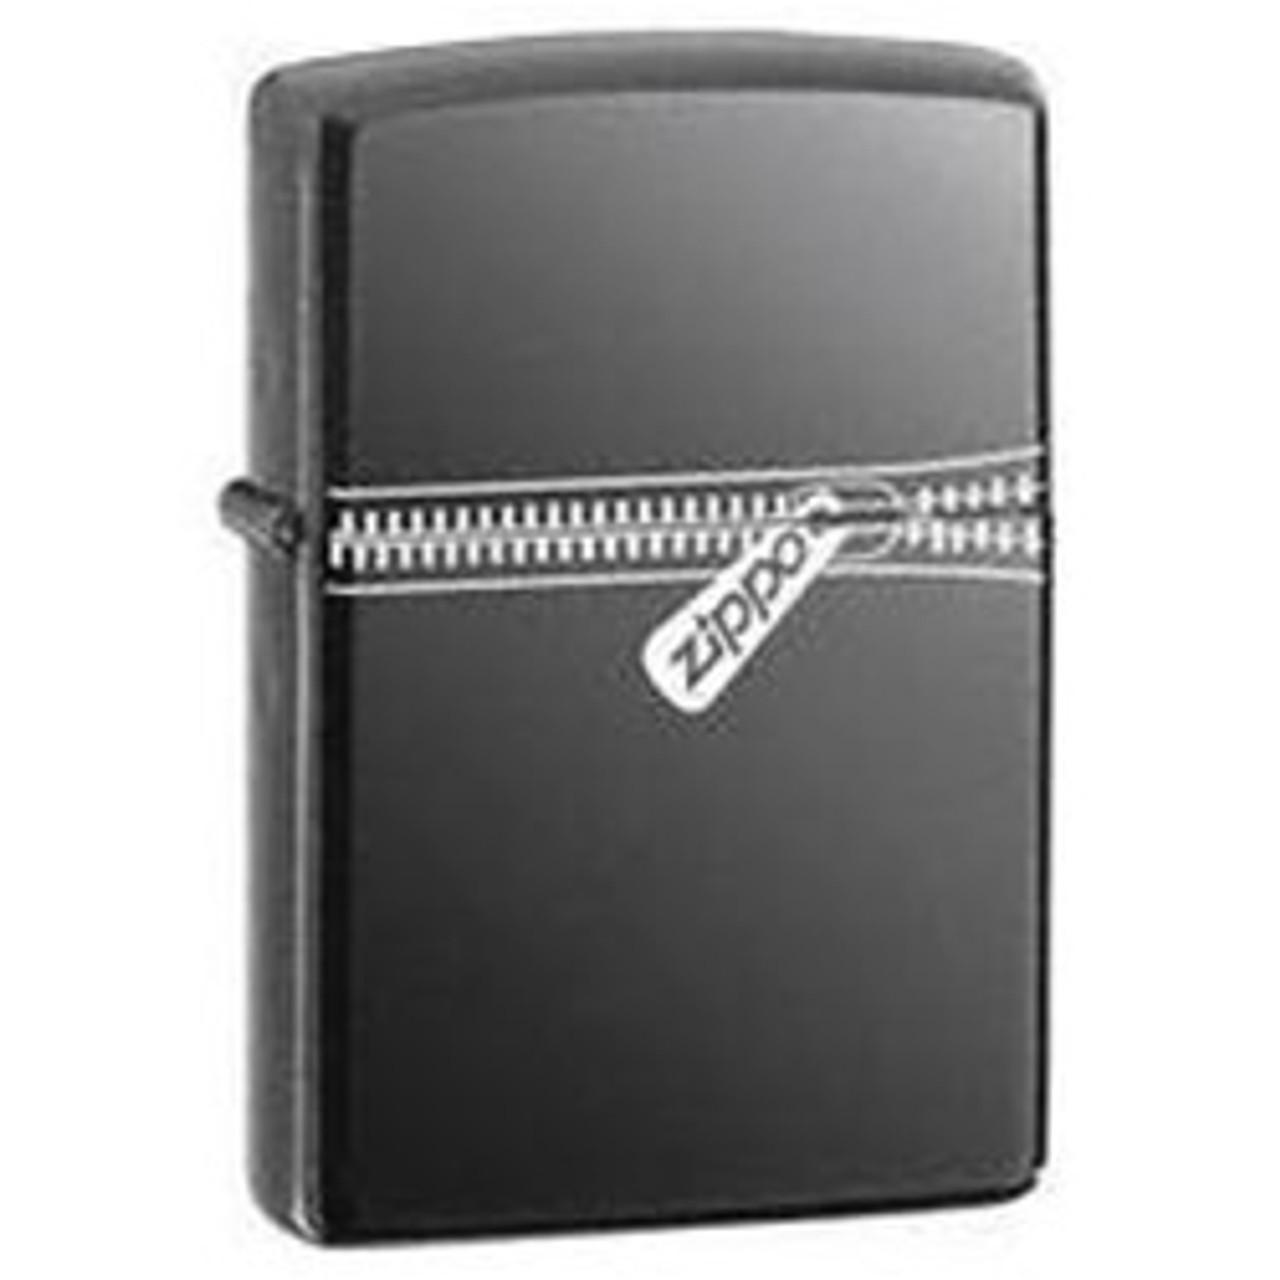 Zippo Black Ice Zipped Lighter, Zippo 21088